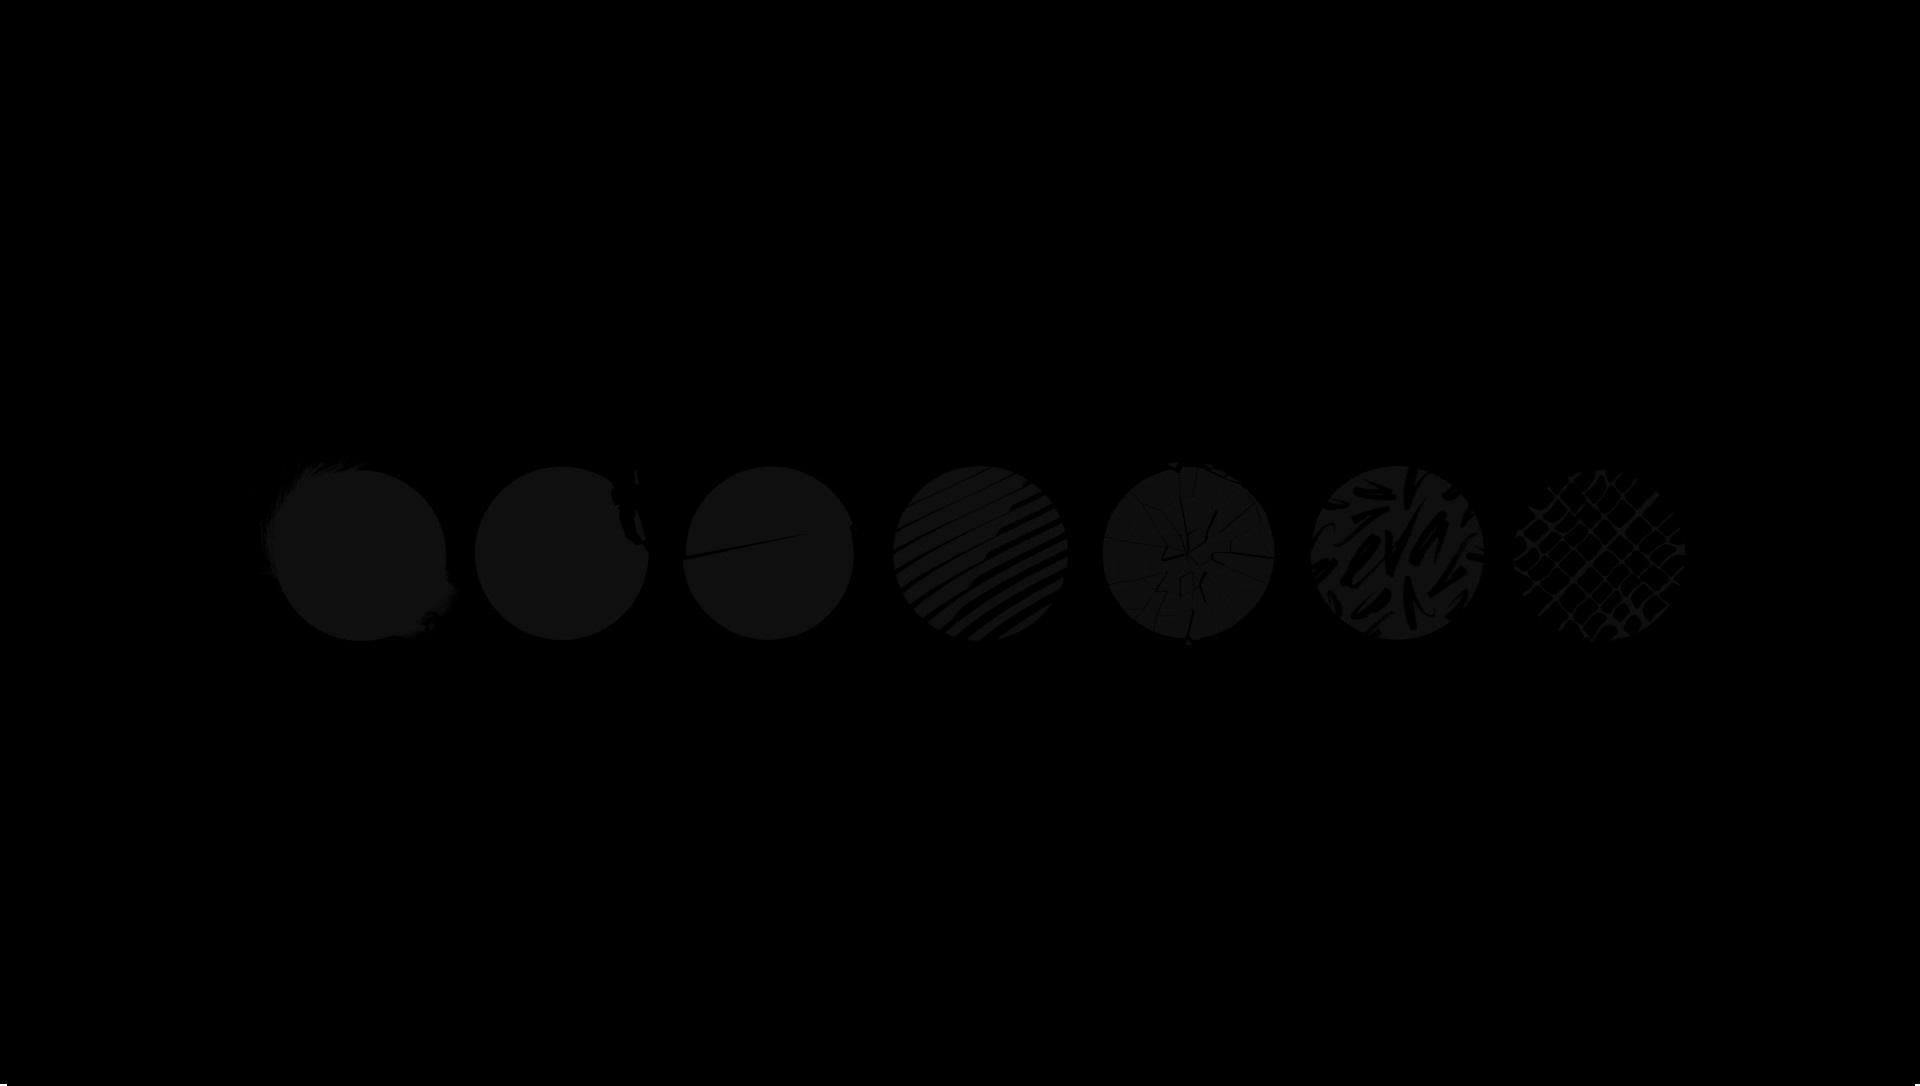 Download 4000+ Wallpaper Black Bts  Gratis